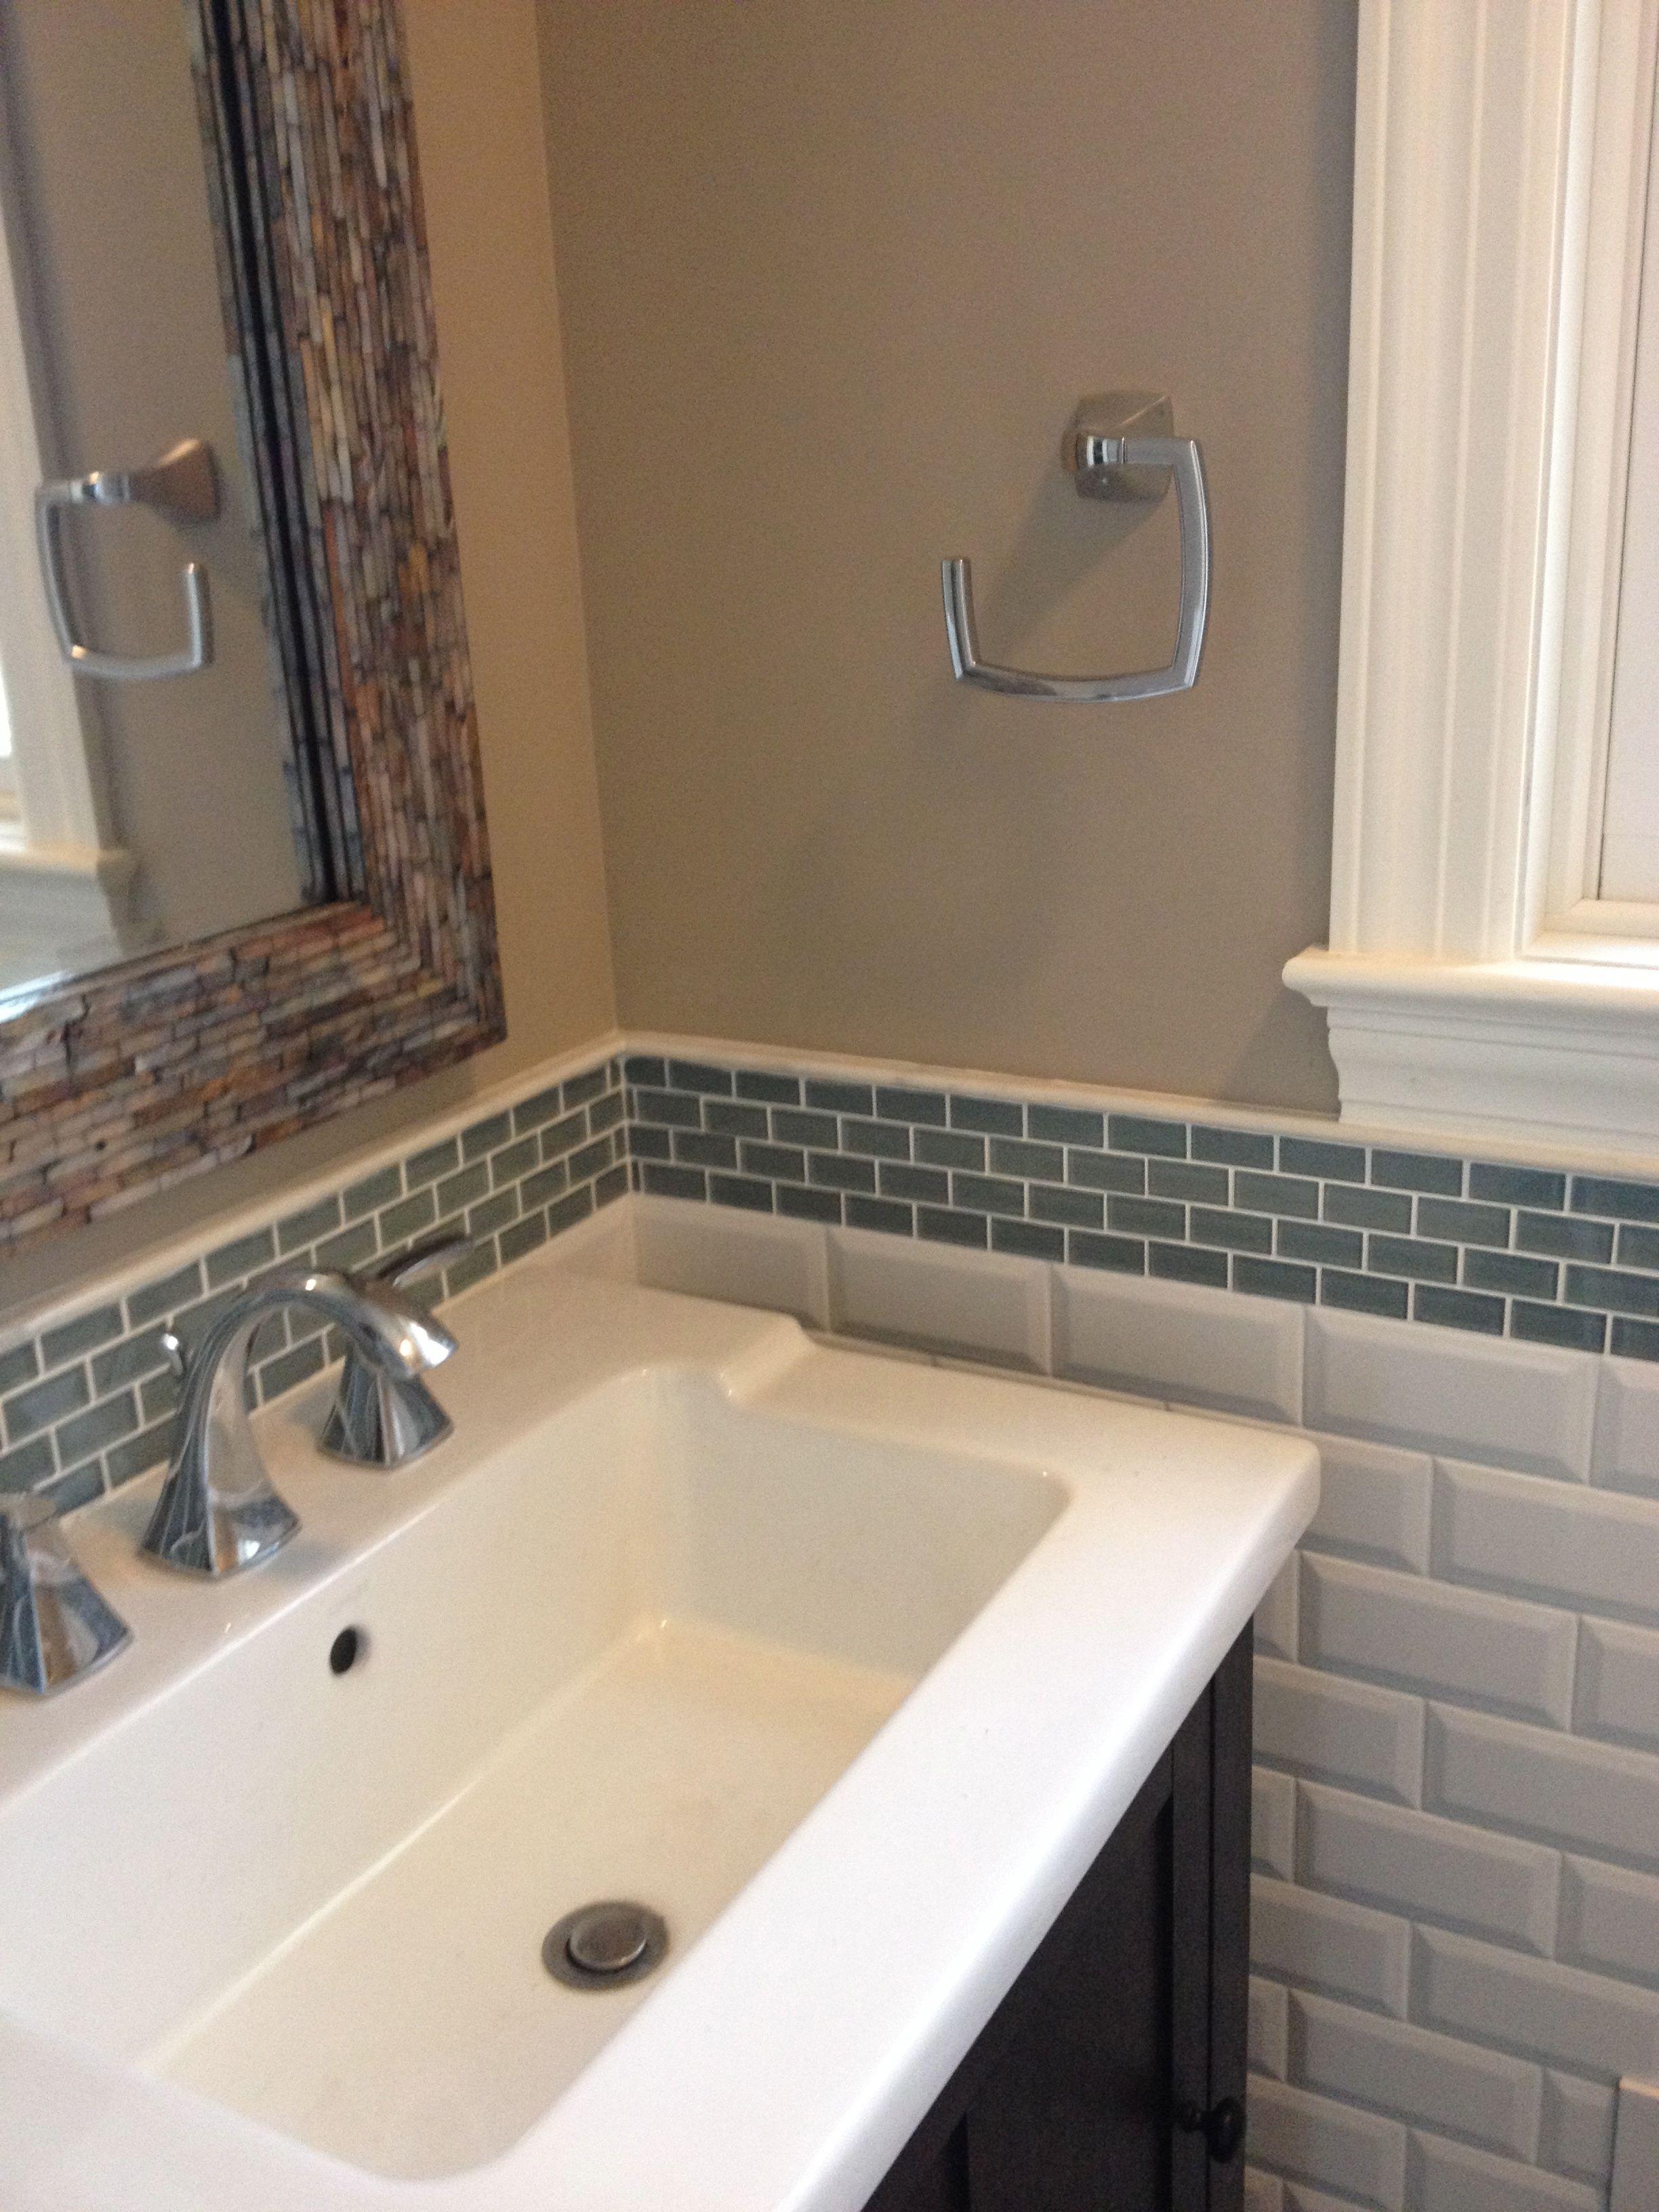 Ocean 1x2 Mini Glass Subway Tile Tile Backsplash Bathroom Glass